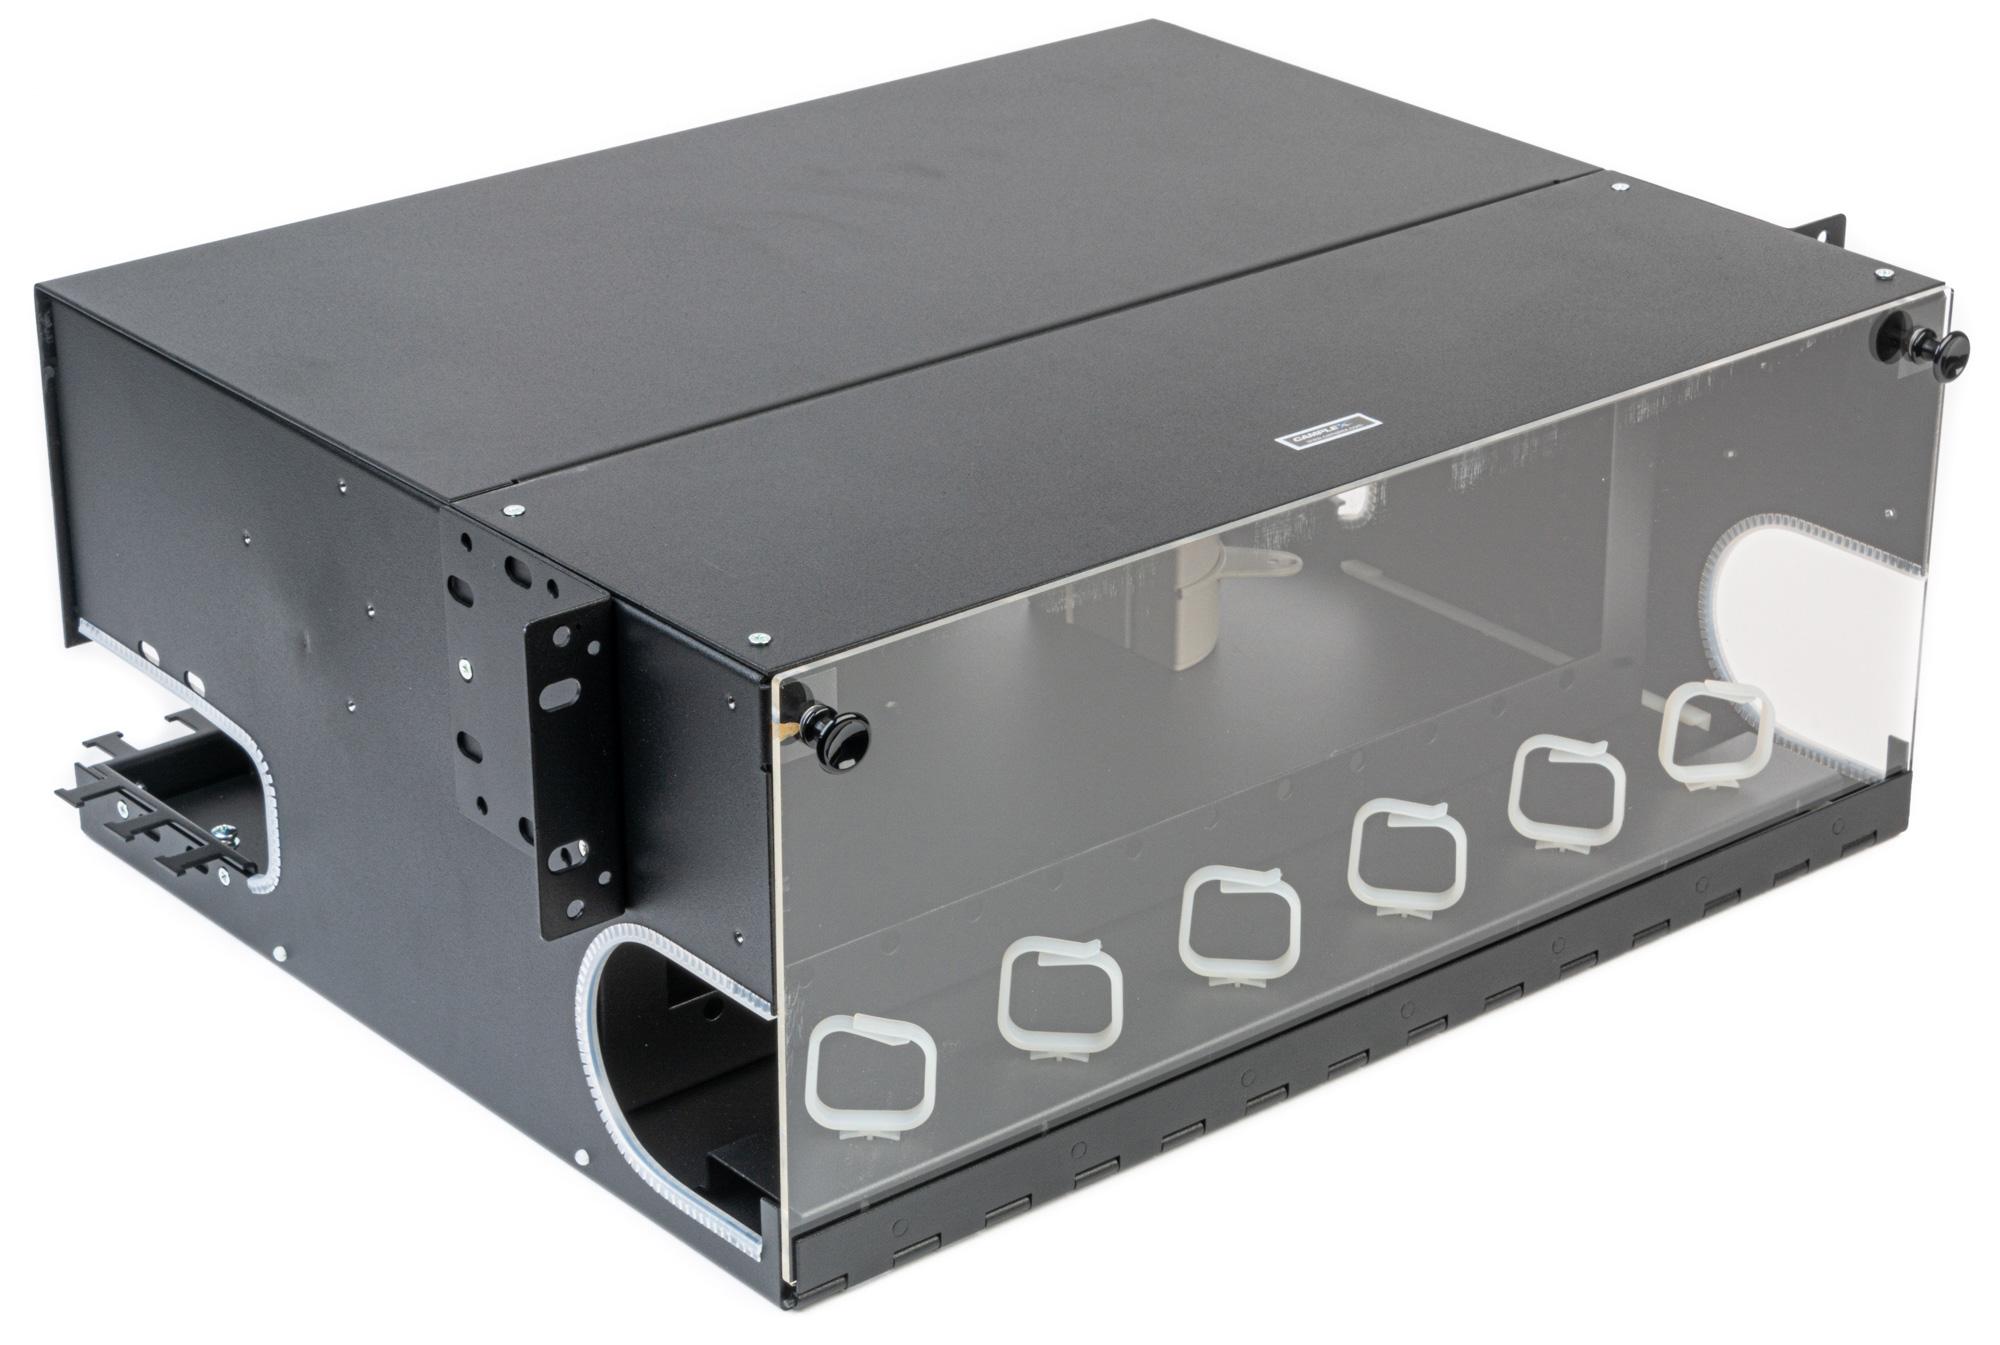 Camplex CMX-MPR-4RU Adjustable Fiber Enclosure for 19/23-In Racks - 12 Modules up to 288 Fiber (Bstock - Used/Repaired) CMX-MPR-4RU-BS